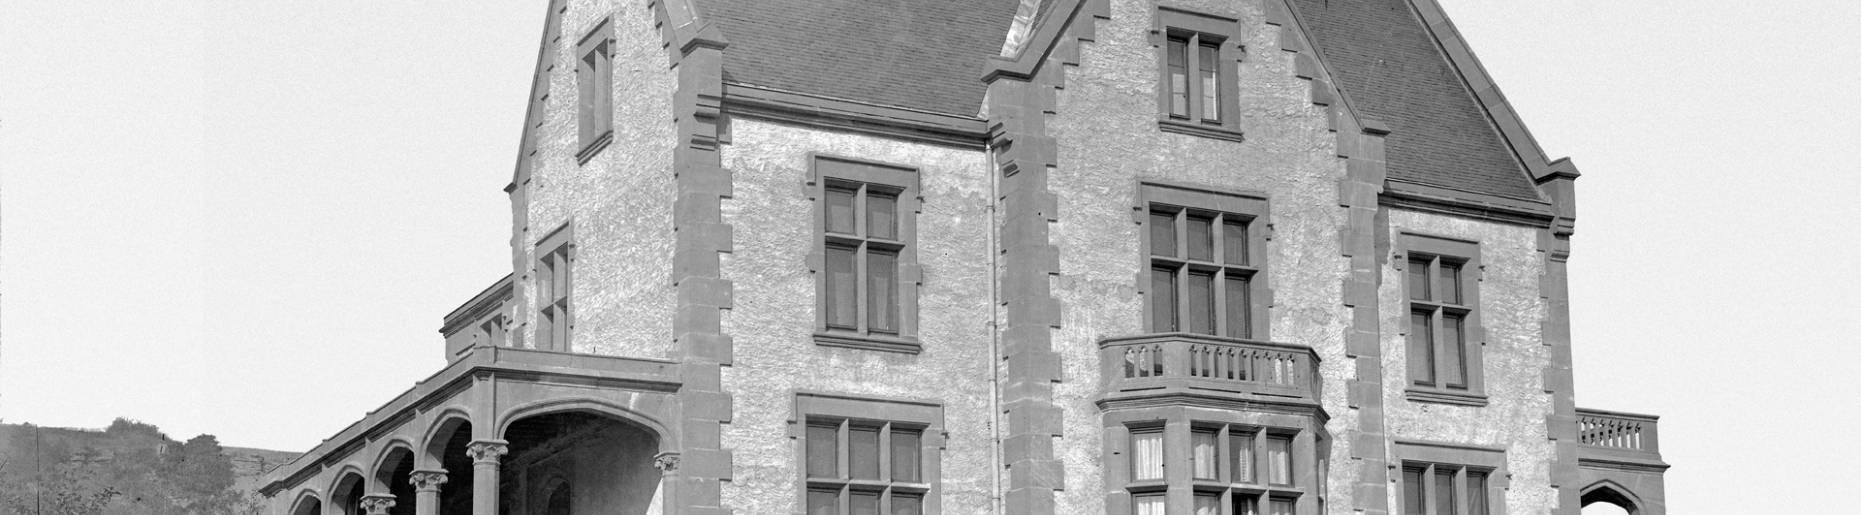 museum henri tudor rosport buiten